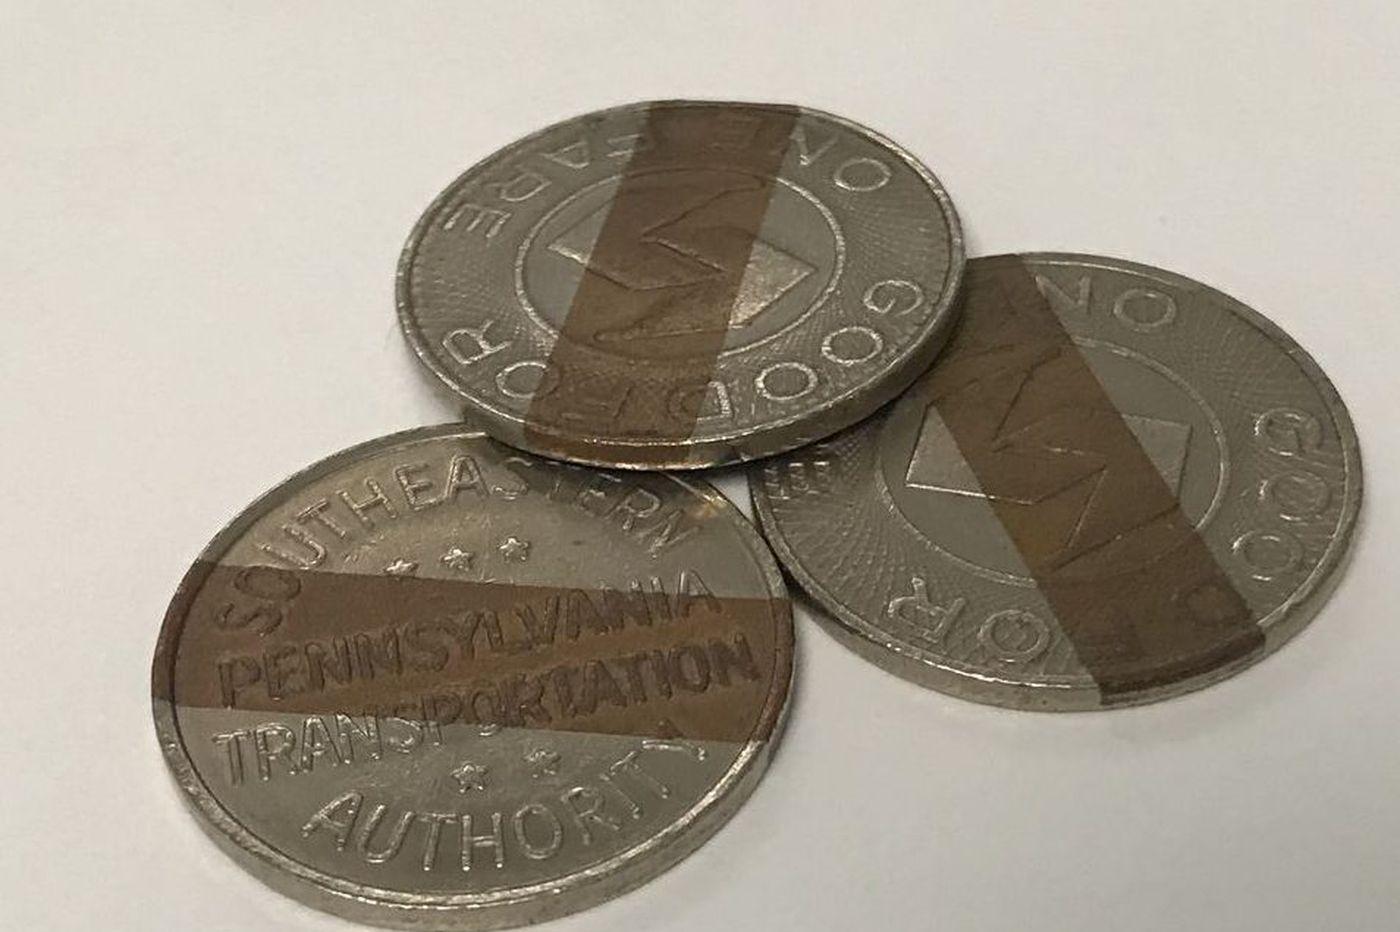 SEPTA to end token sales April 30